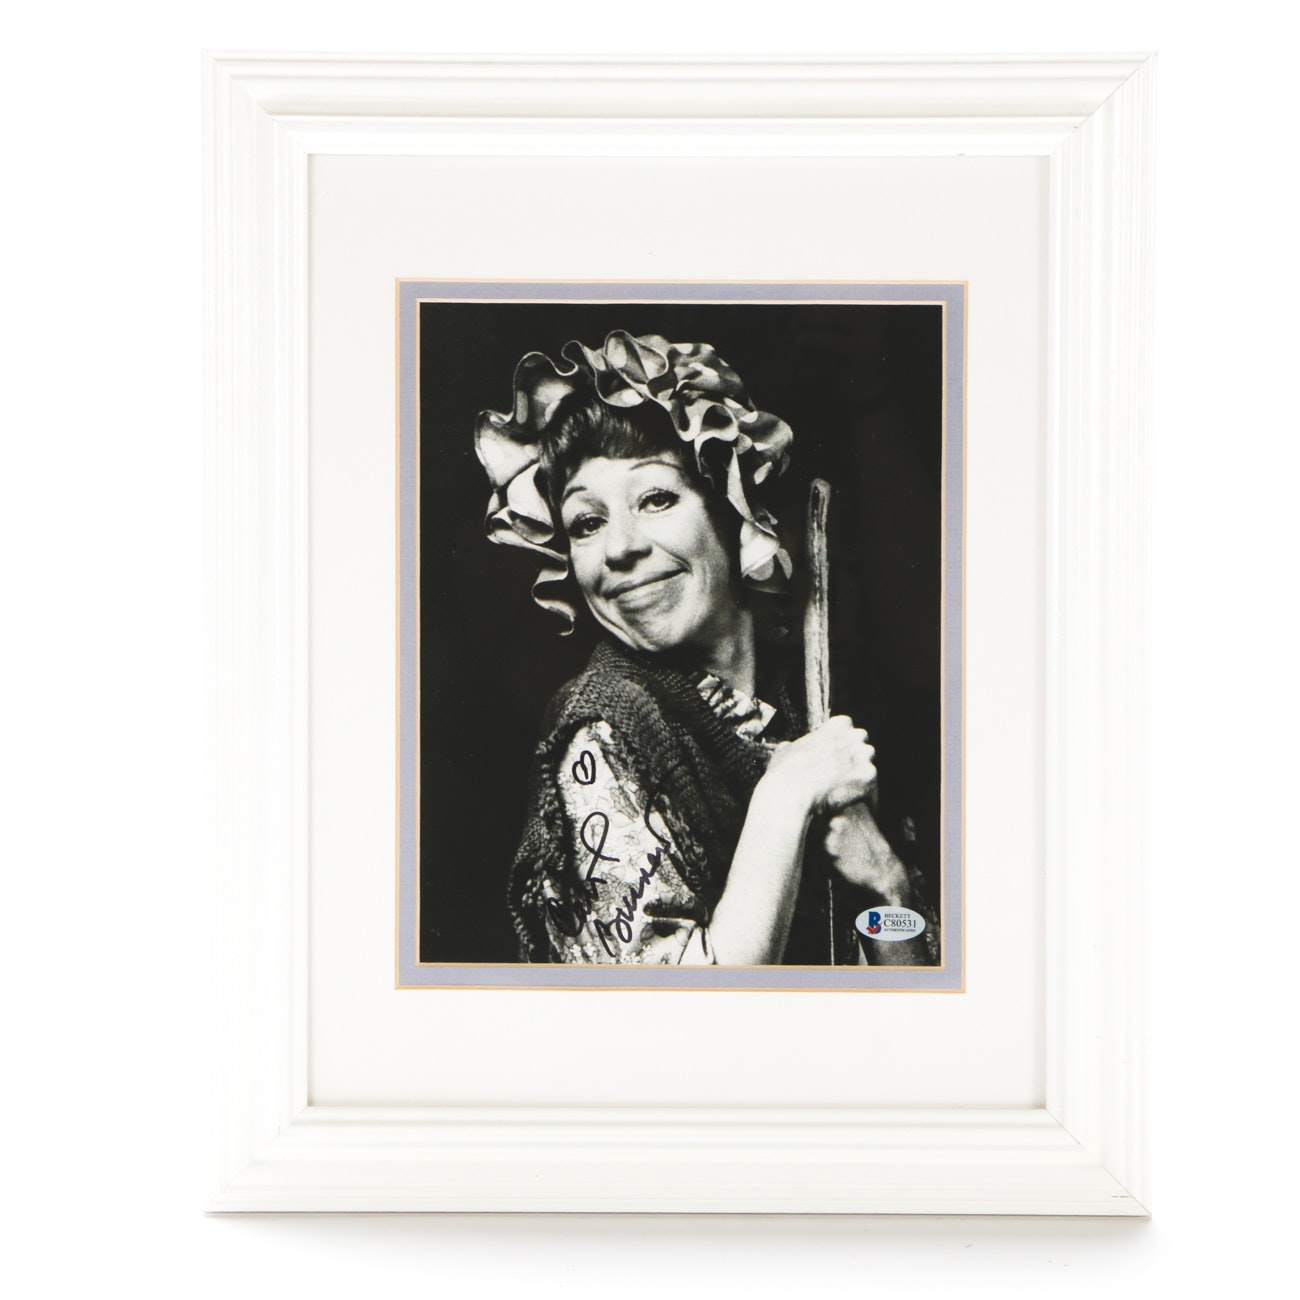 Carol Burnett Television Legendary Comic Signed Framed Display Beckett COA